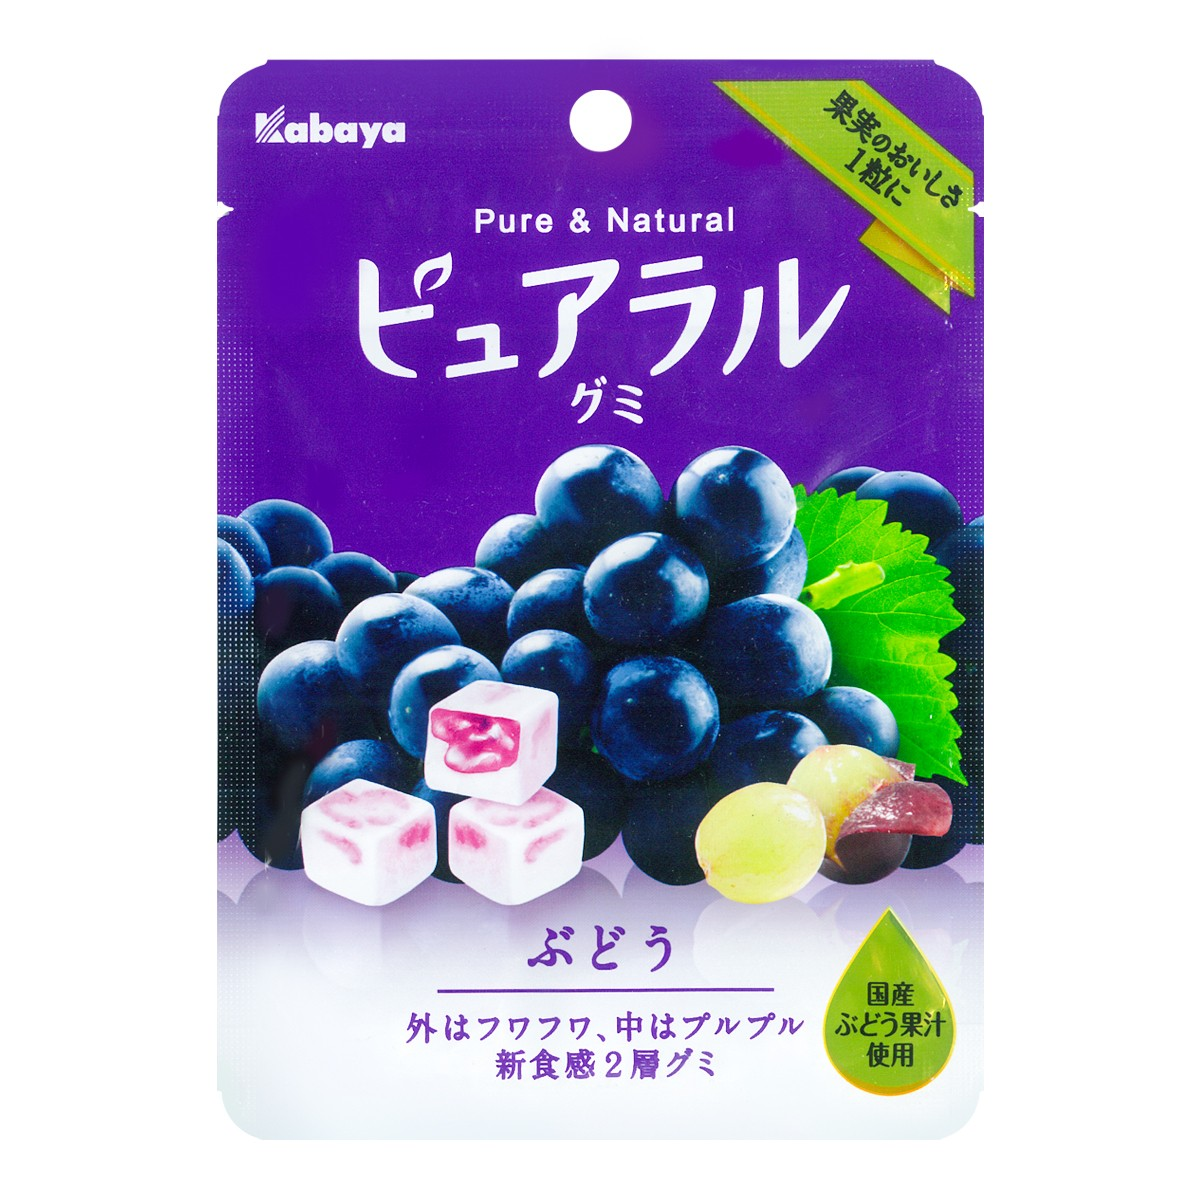 KABAYA Grape Jam Filling Collagen Gummy Candy 50g